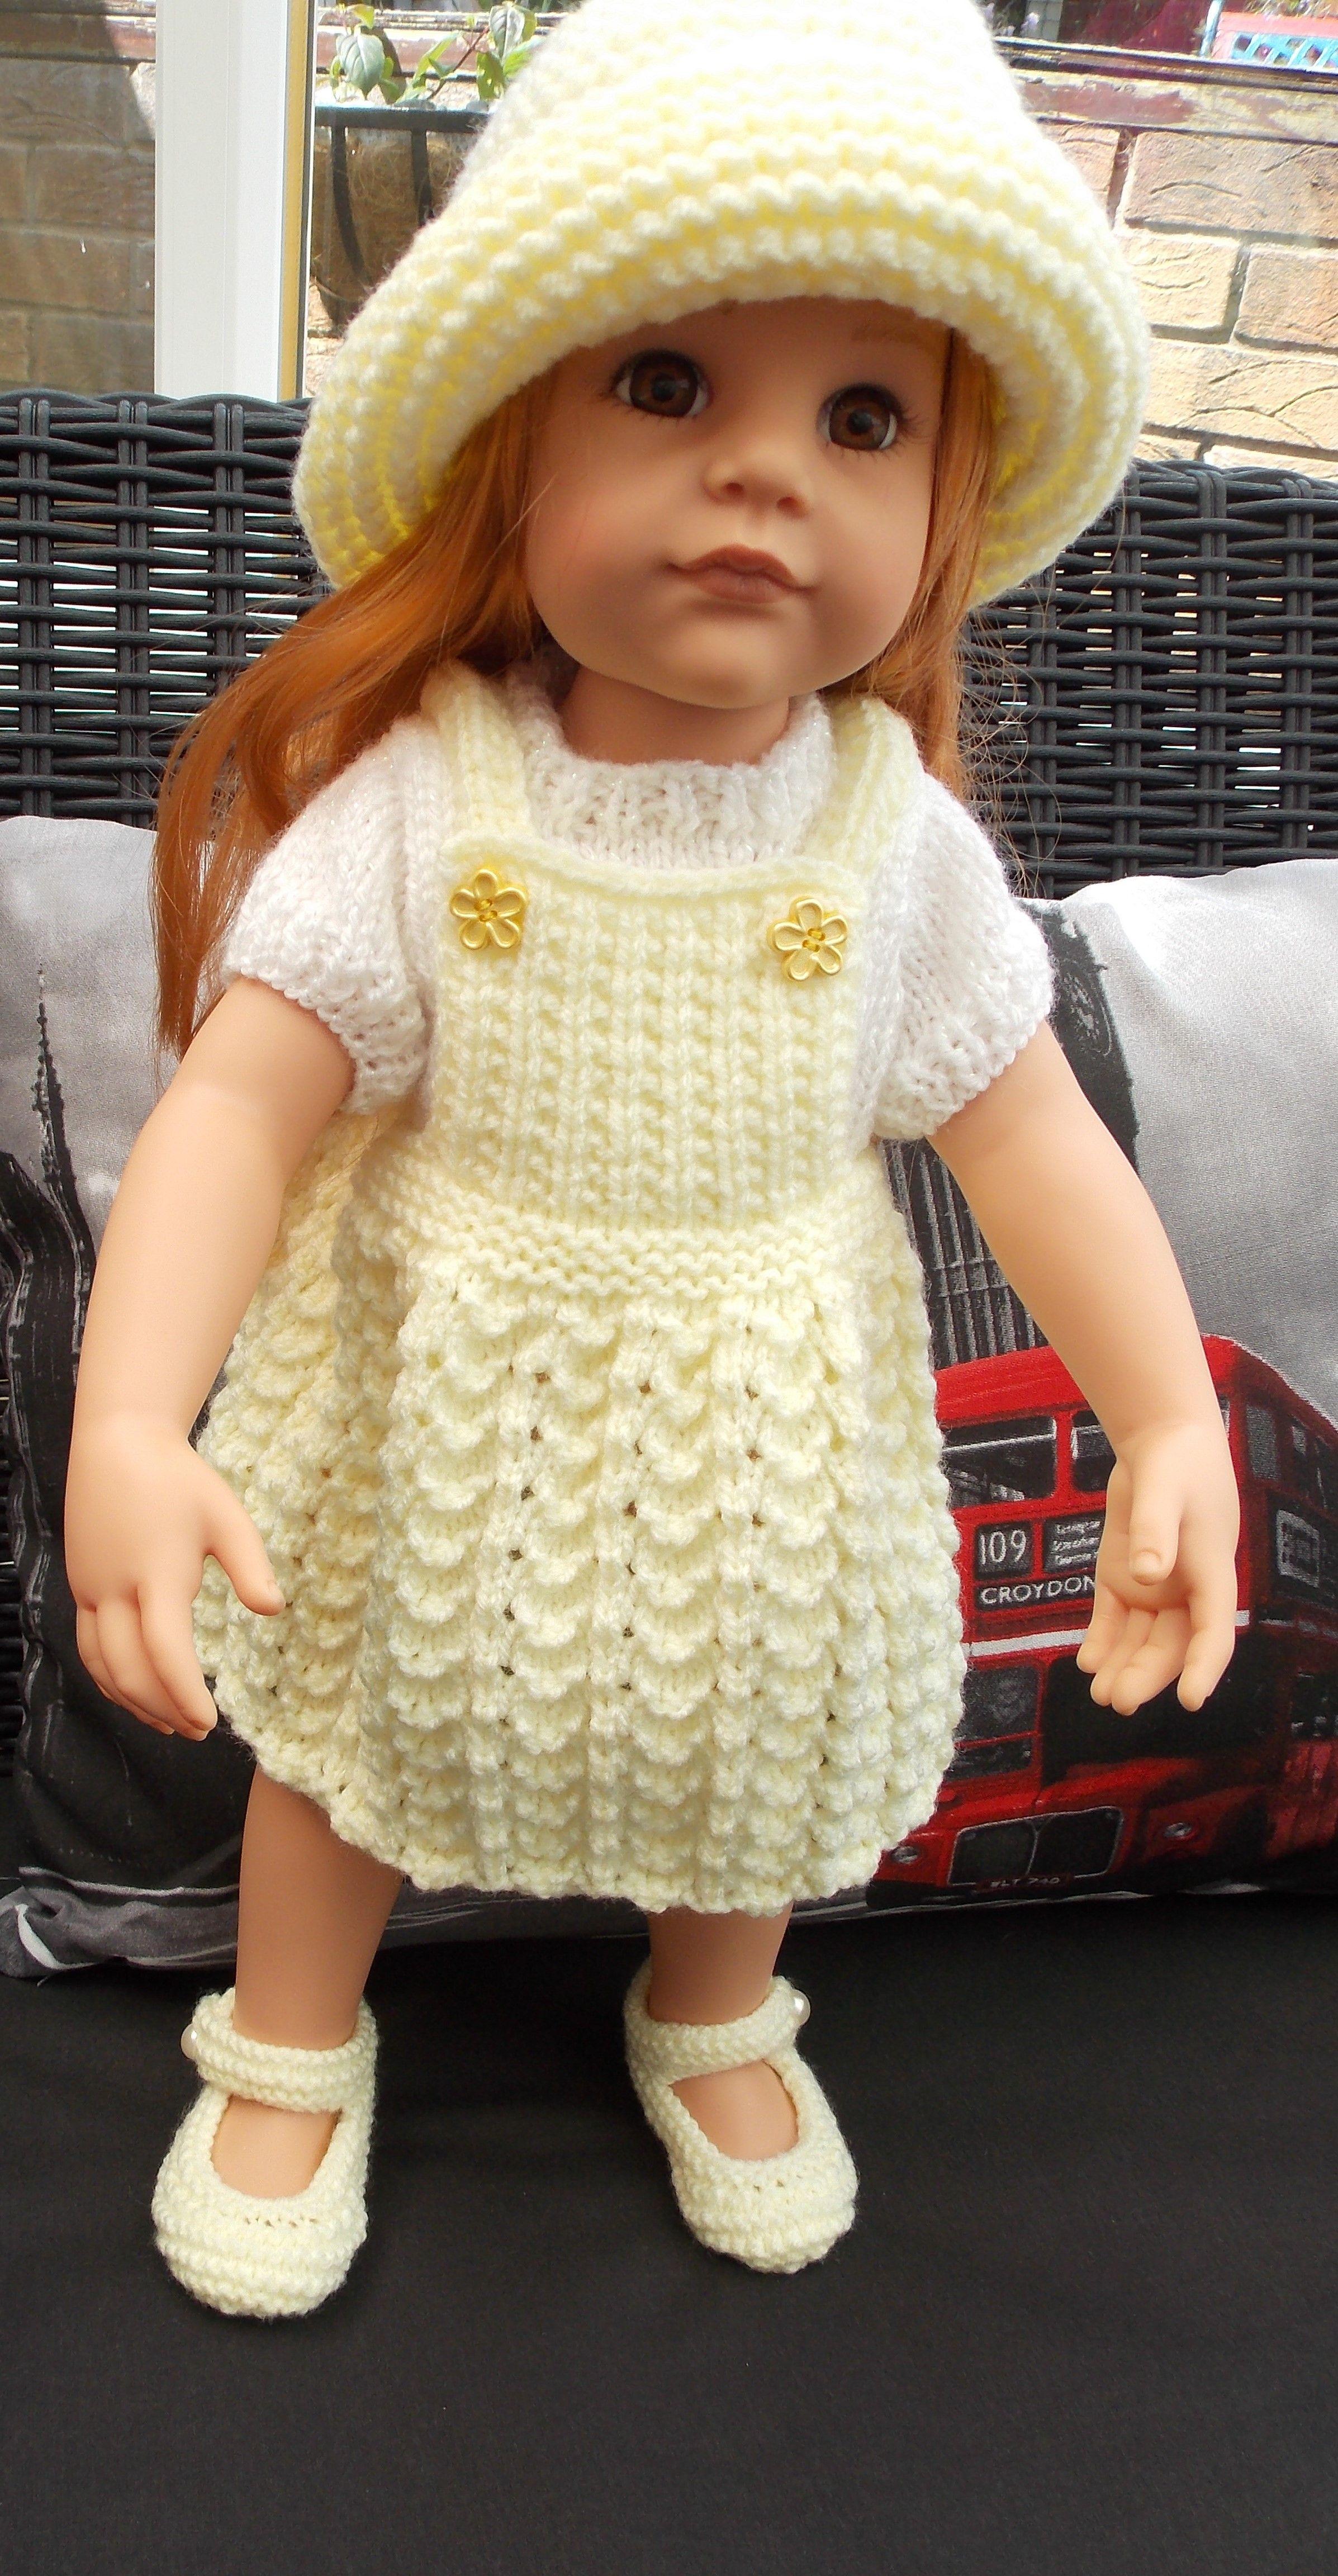 Pin de S D en مدل لباس بافتنی عروسک | Pinterest | Las muñecas ...